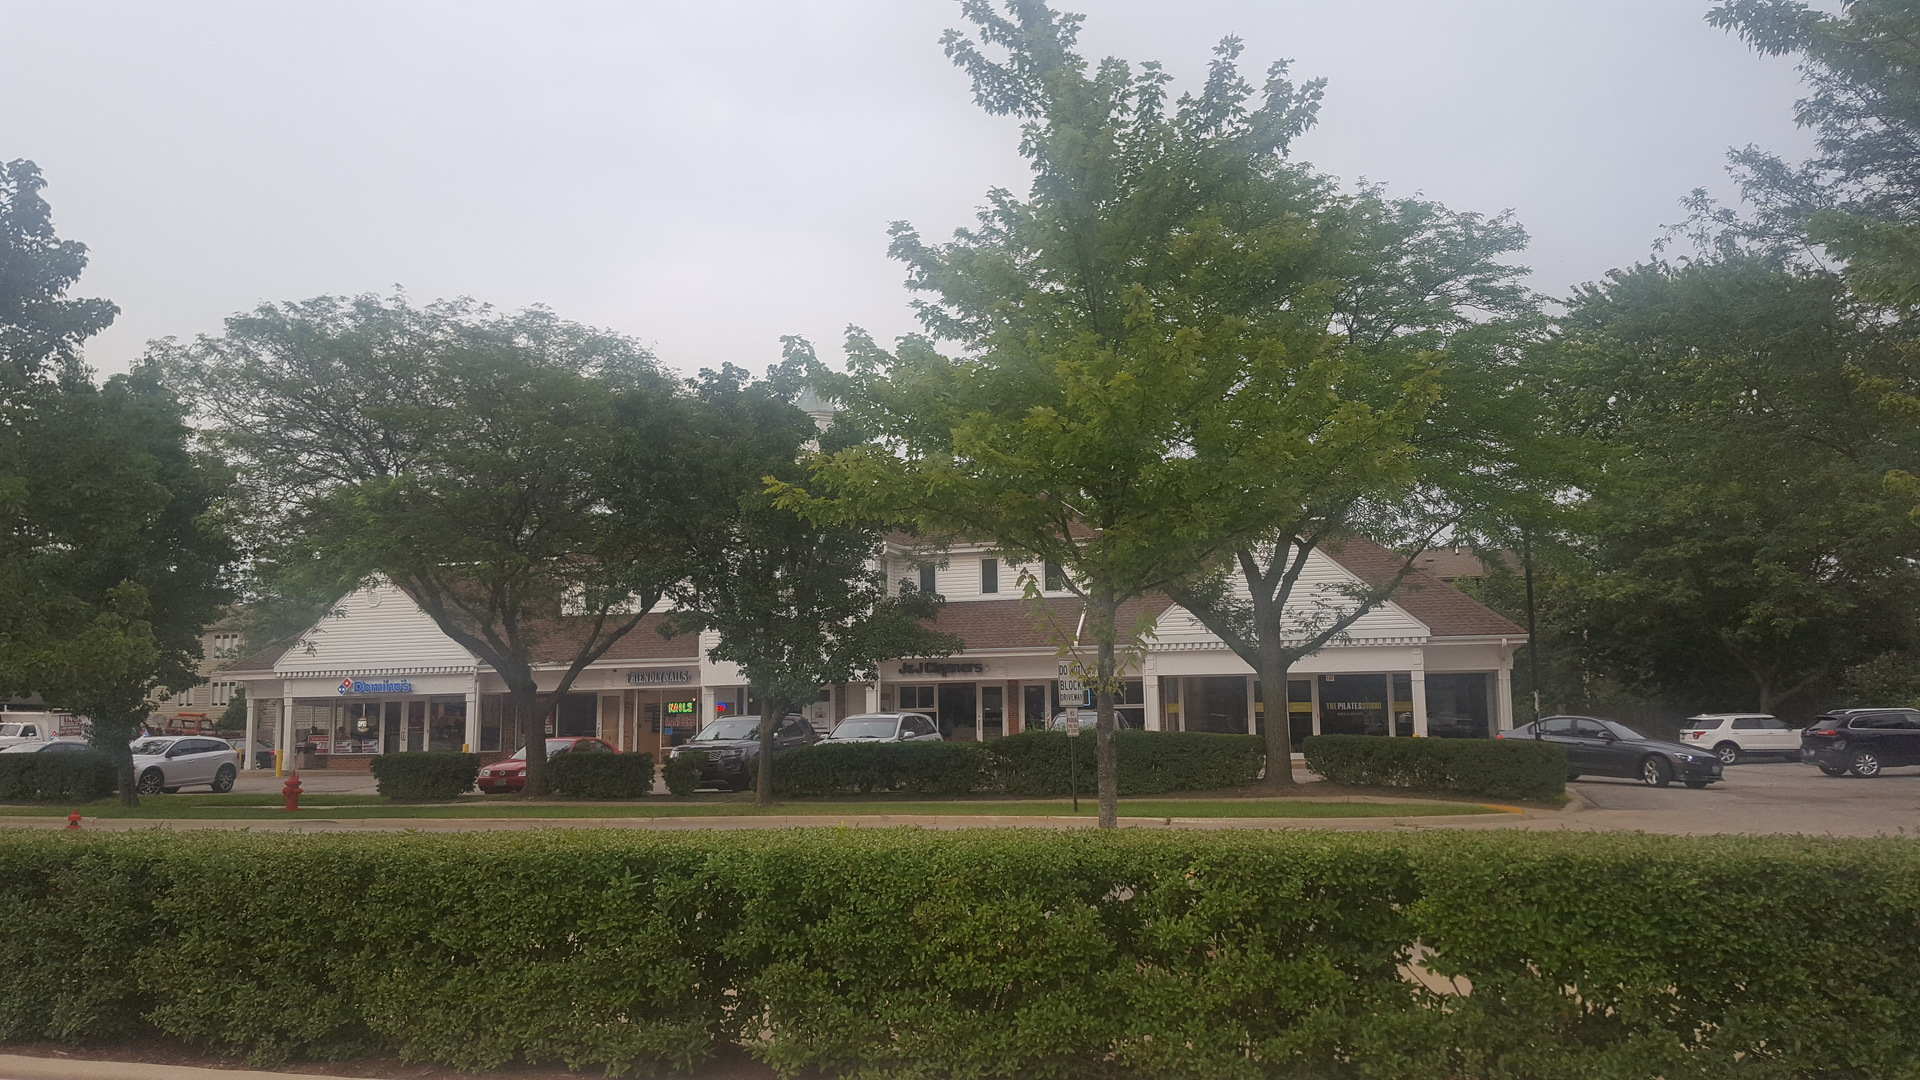 338 Ridge, Wilmette, Illinois 60091